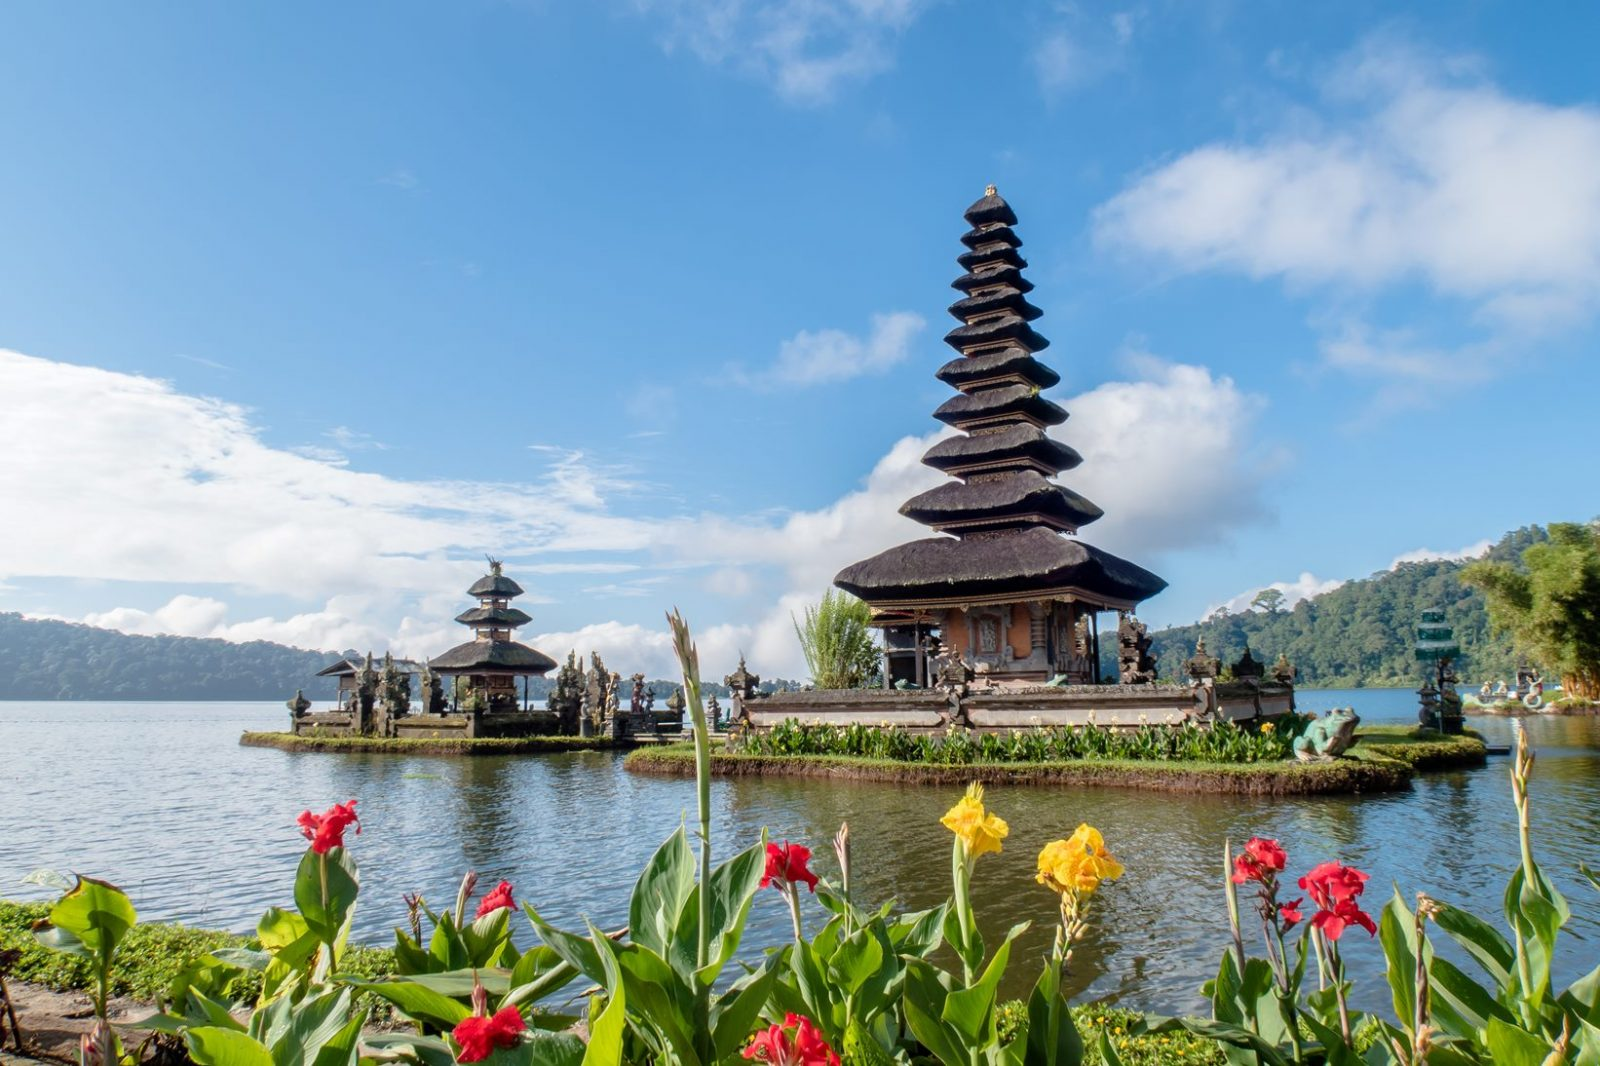 Храм Пура Улун Дану Братан, Бали, Индонезия